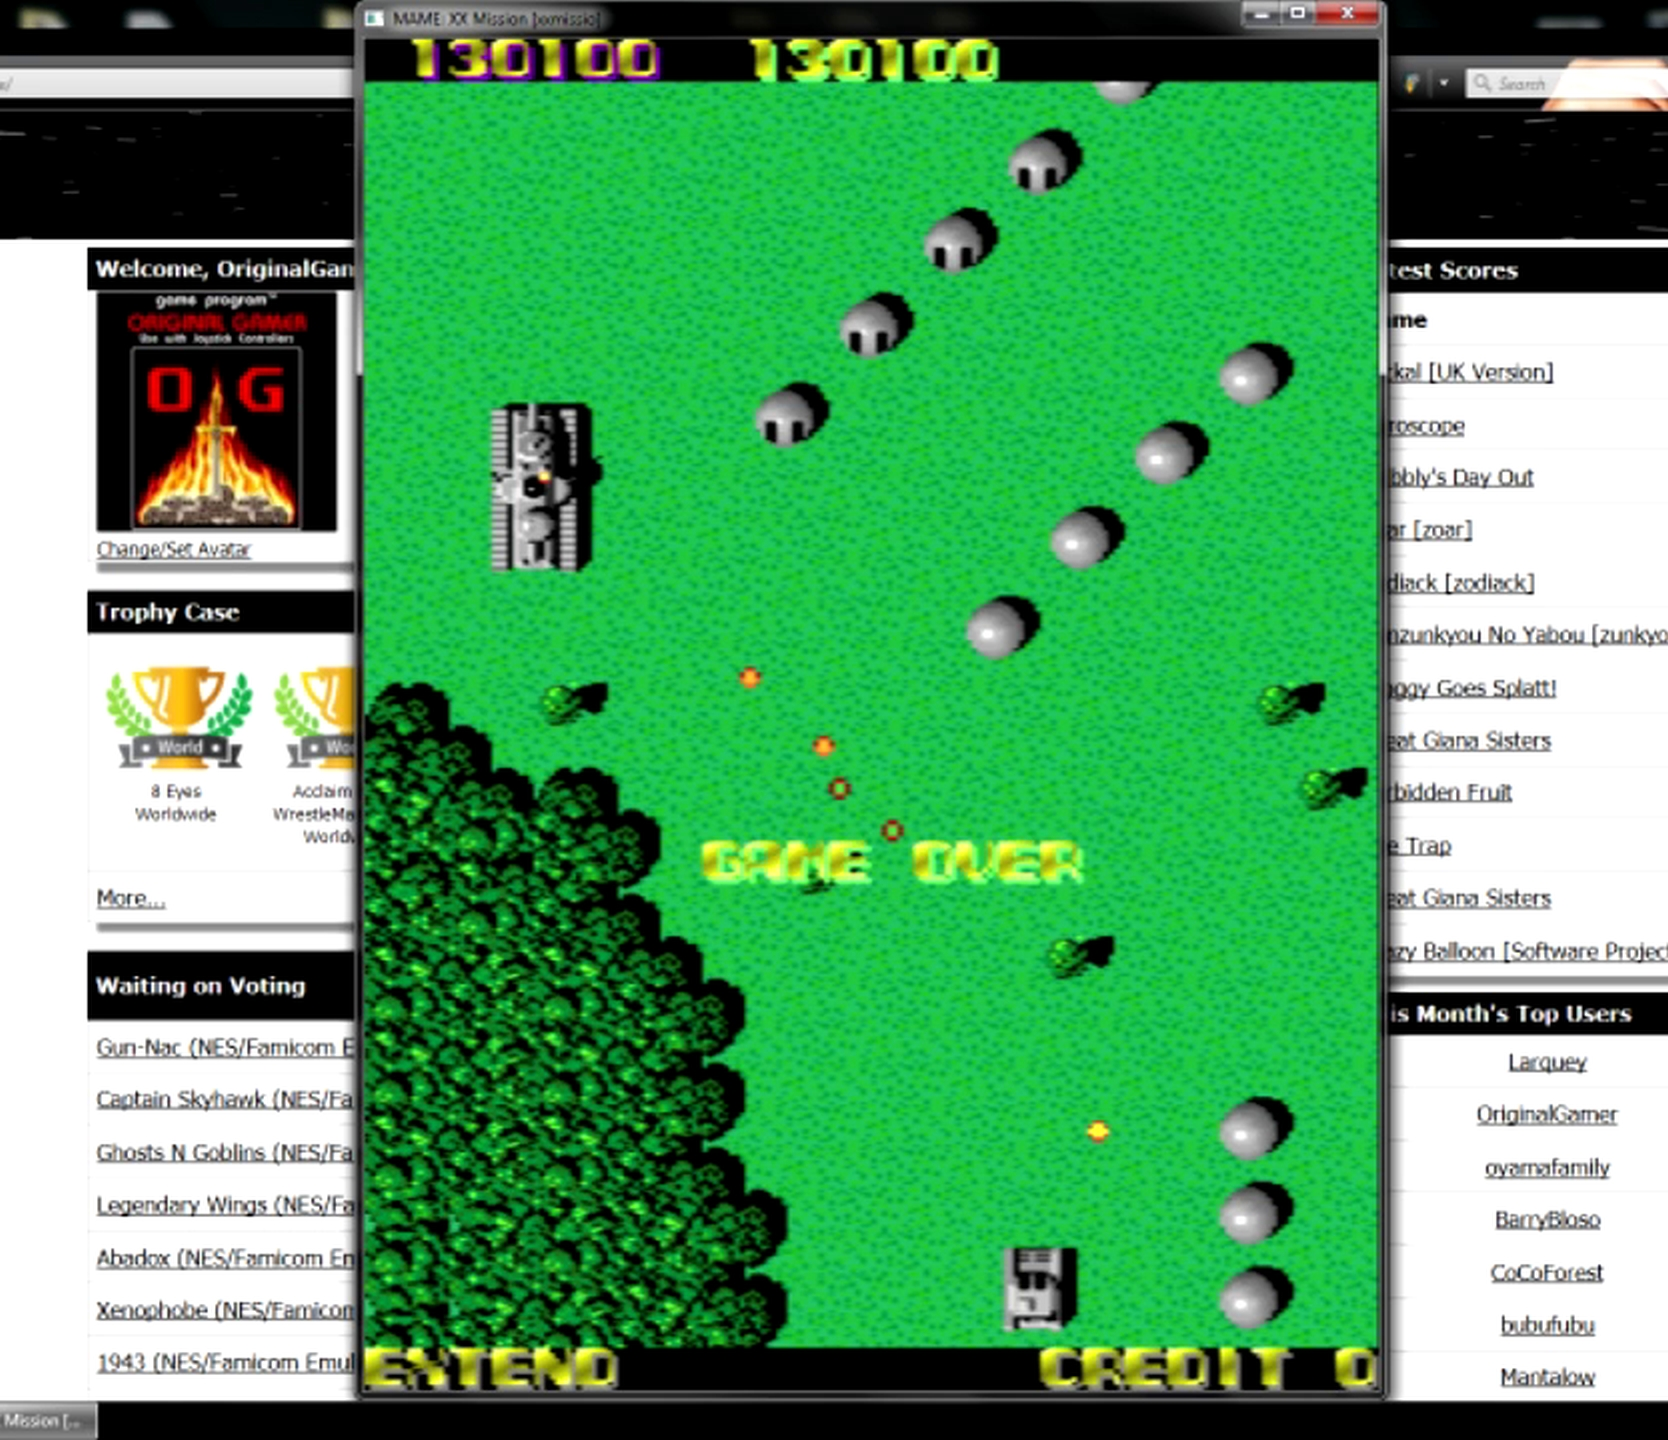 OriginalGamer: XX Mission [xxmissio] (Arcade Emulated / M.A.M.E.) 130,100 points on 2015-05-11 13:16:41